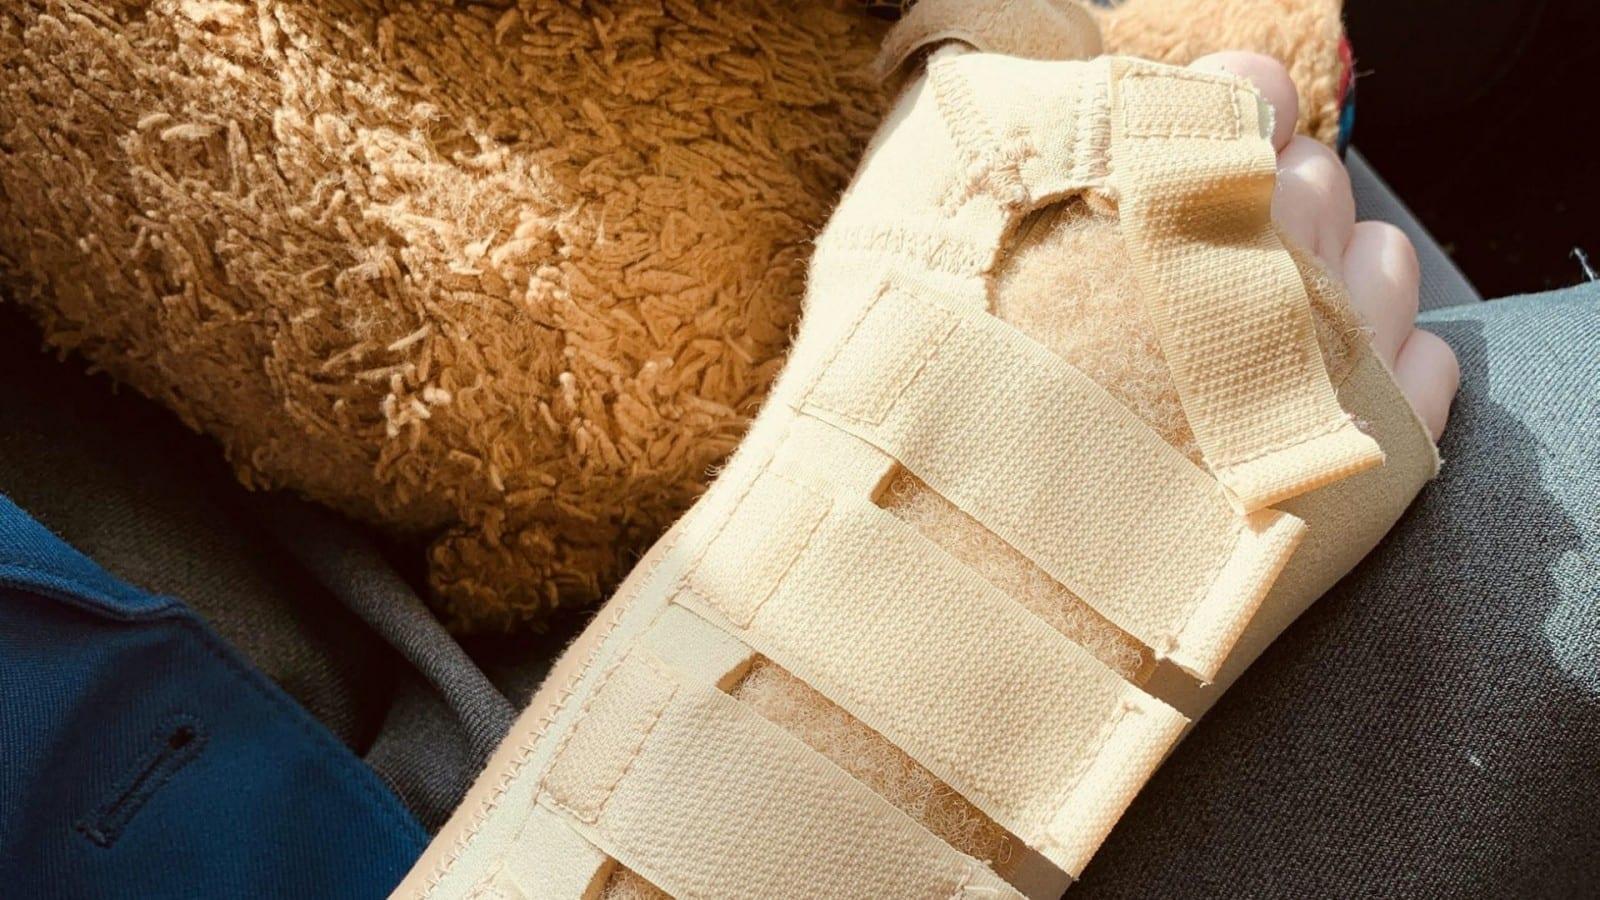 12-year-old girl suffered broken bones playing Russian Rock Paper Scissors using a brick